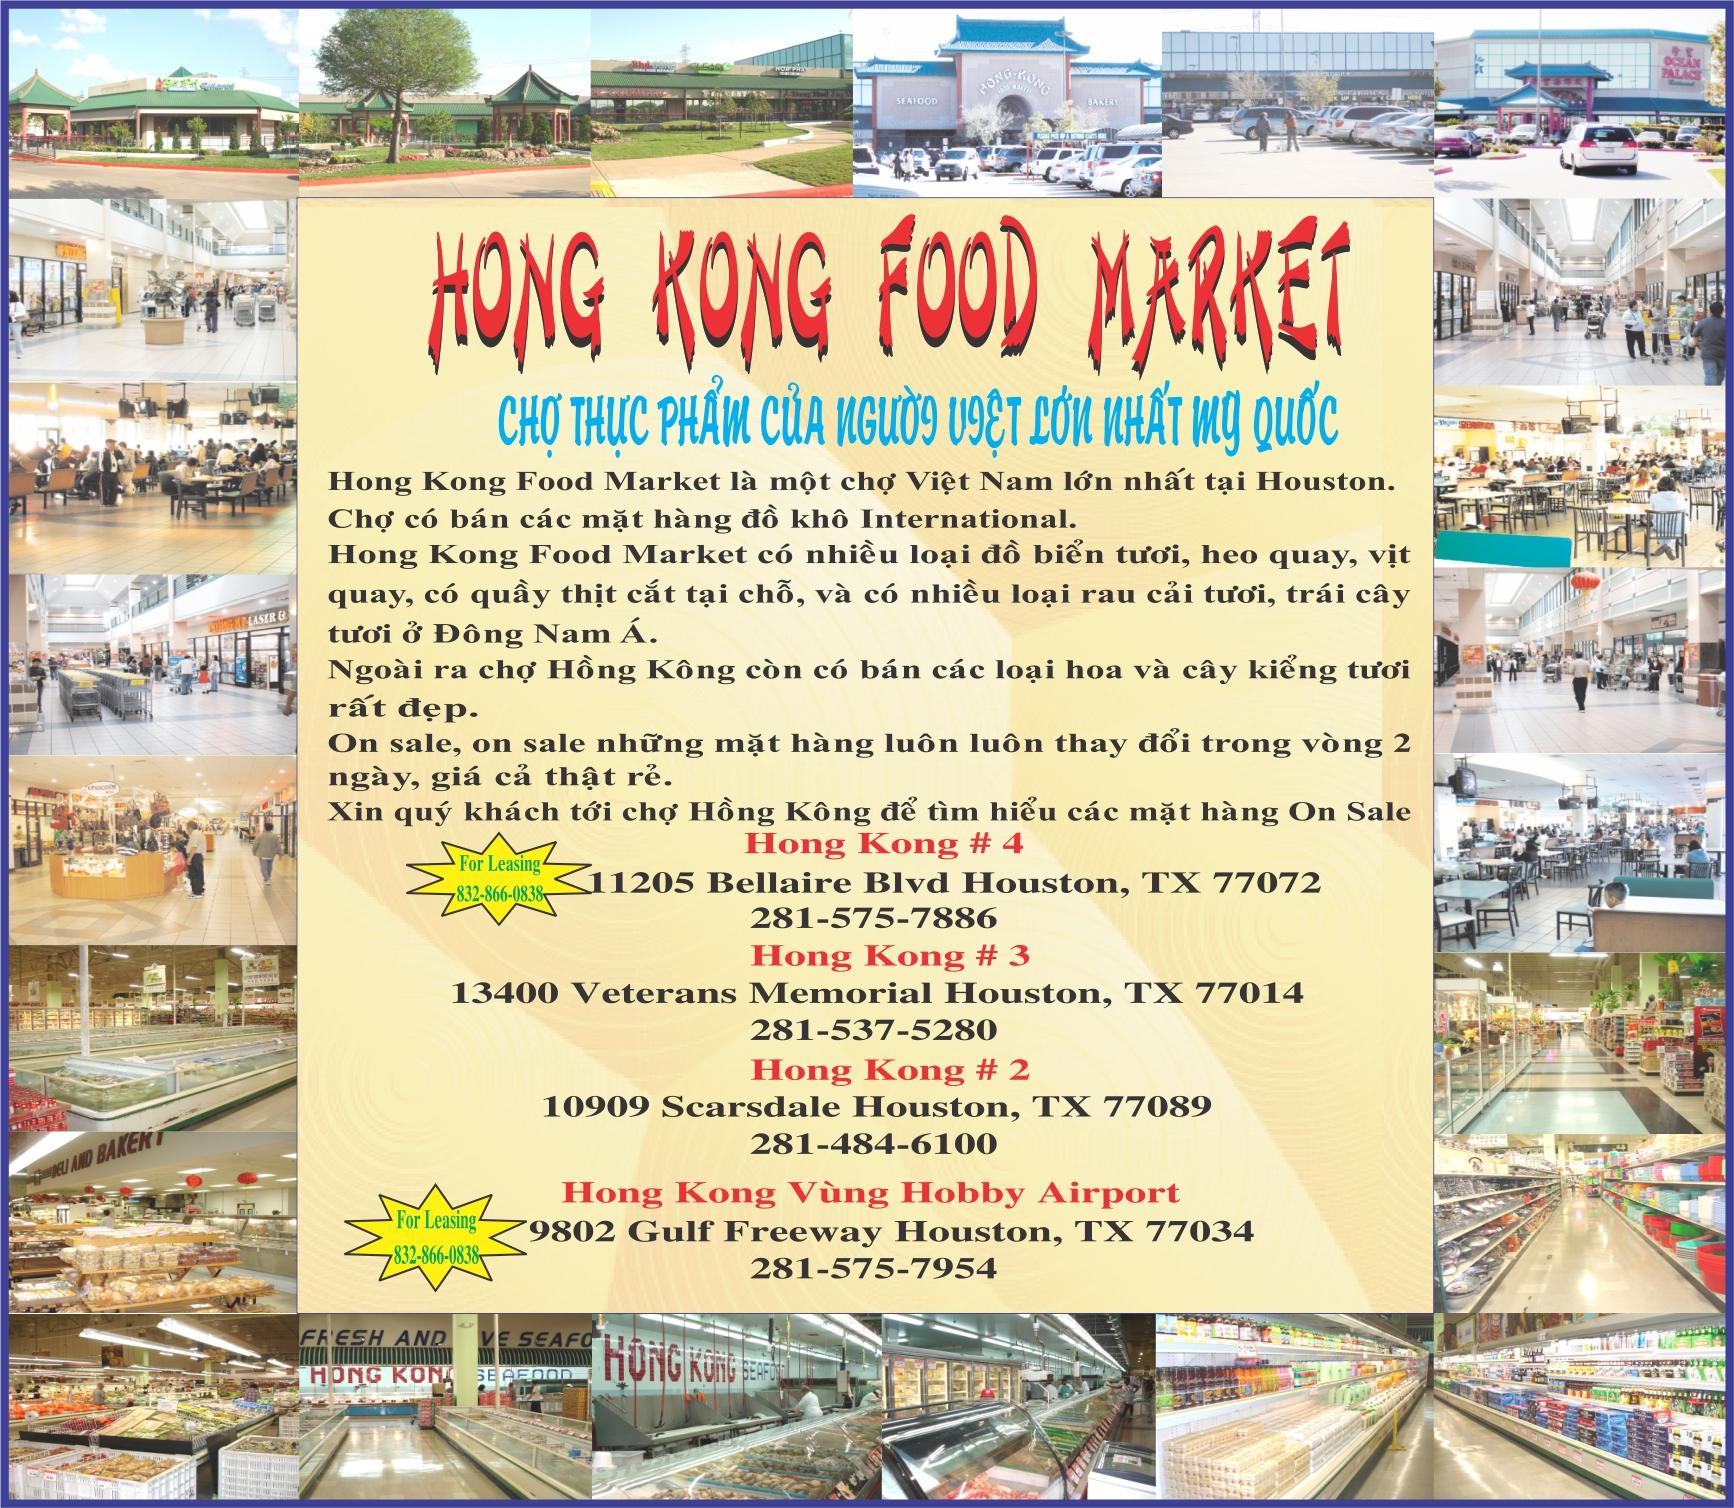 HongKong Food Market